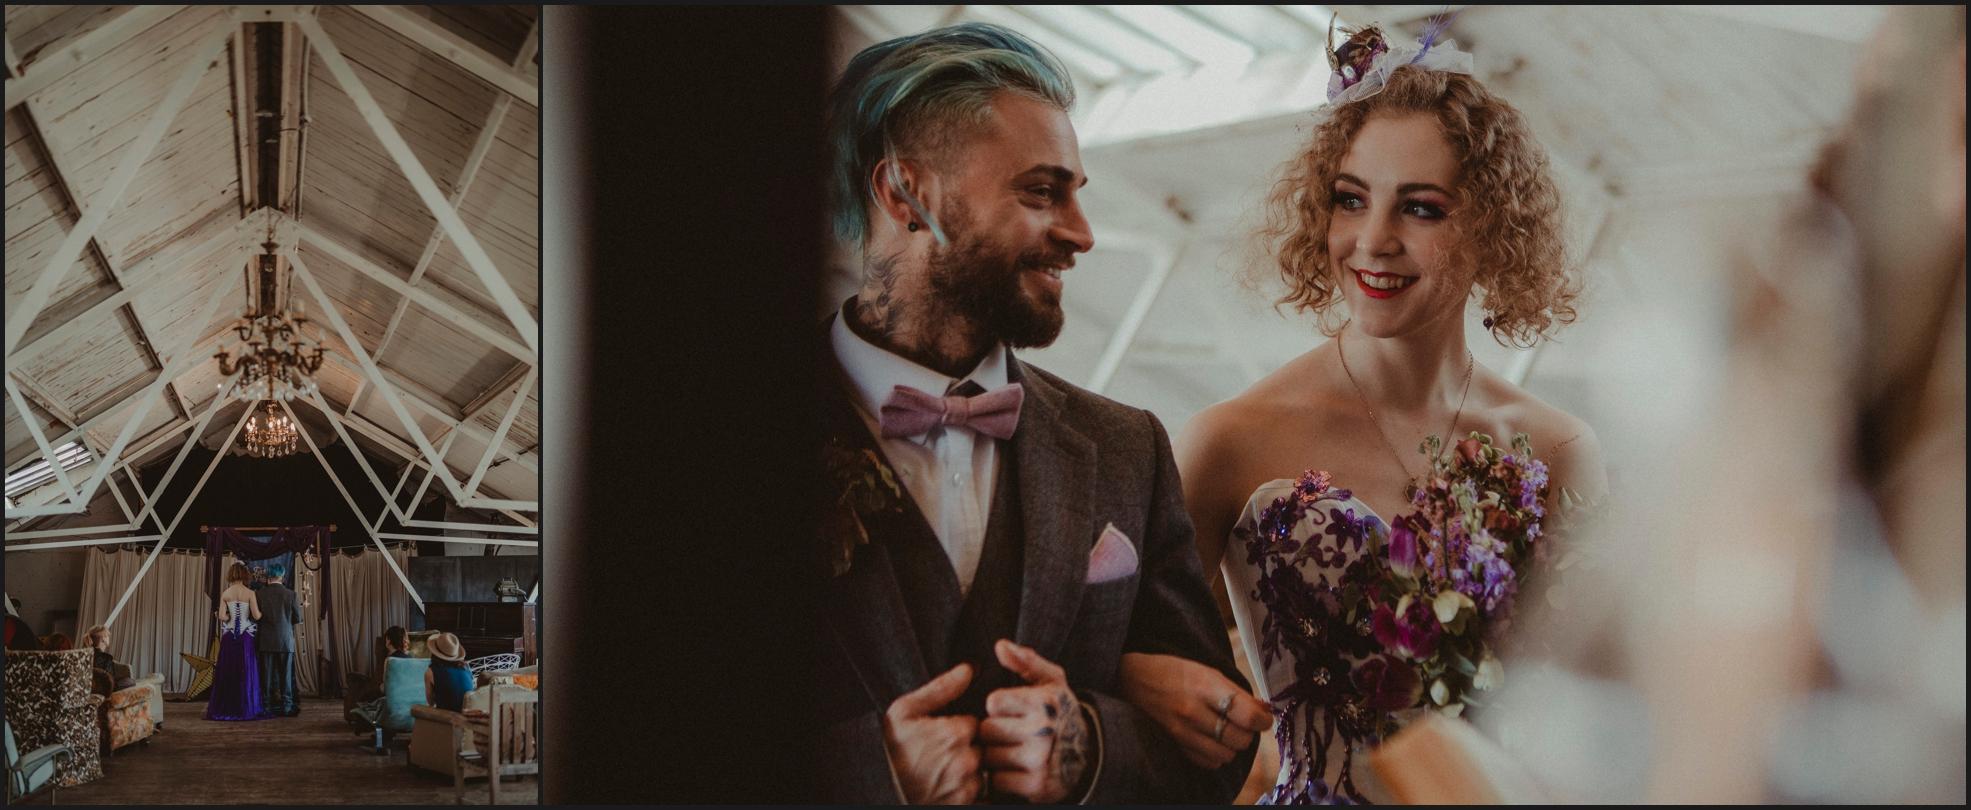 ceremony, wedding ceremony, bride, groom, celebrant, Dalston Heights, London, Steampunk, happy, smiles, couple